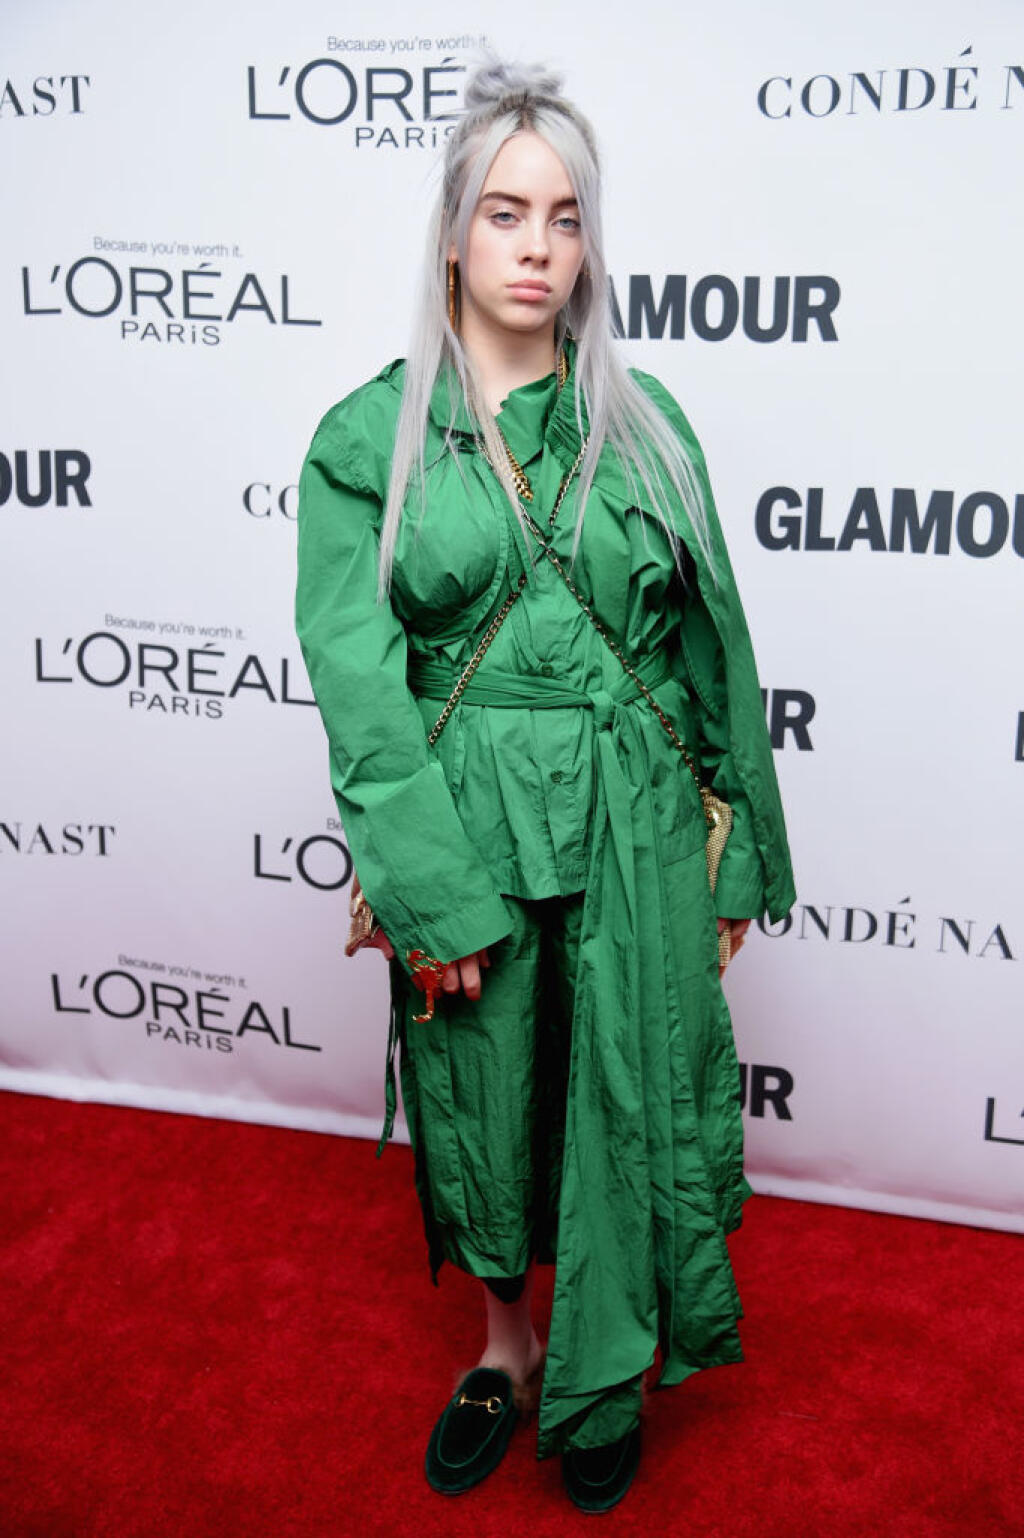 ZMENA: Billie Eilish vymenila svoje zelené vlasy za blond